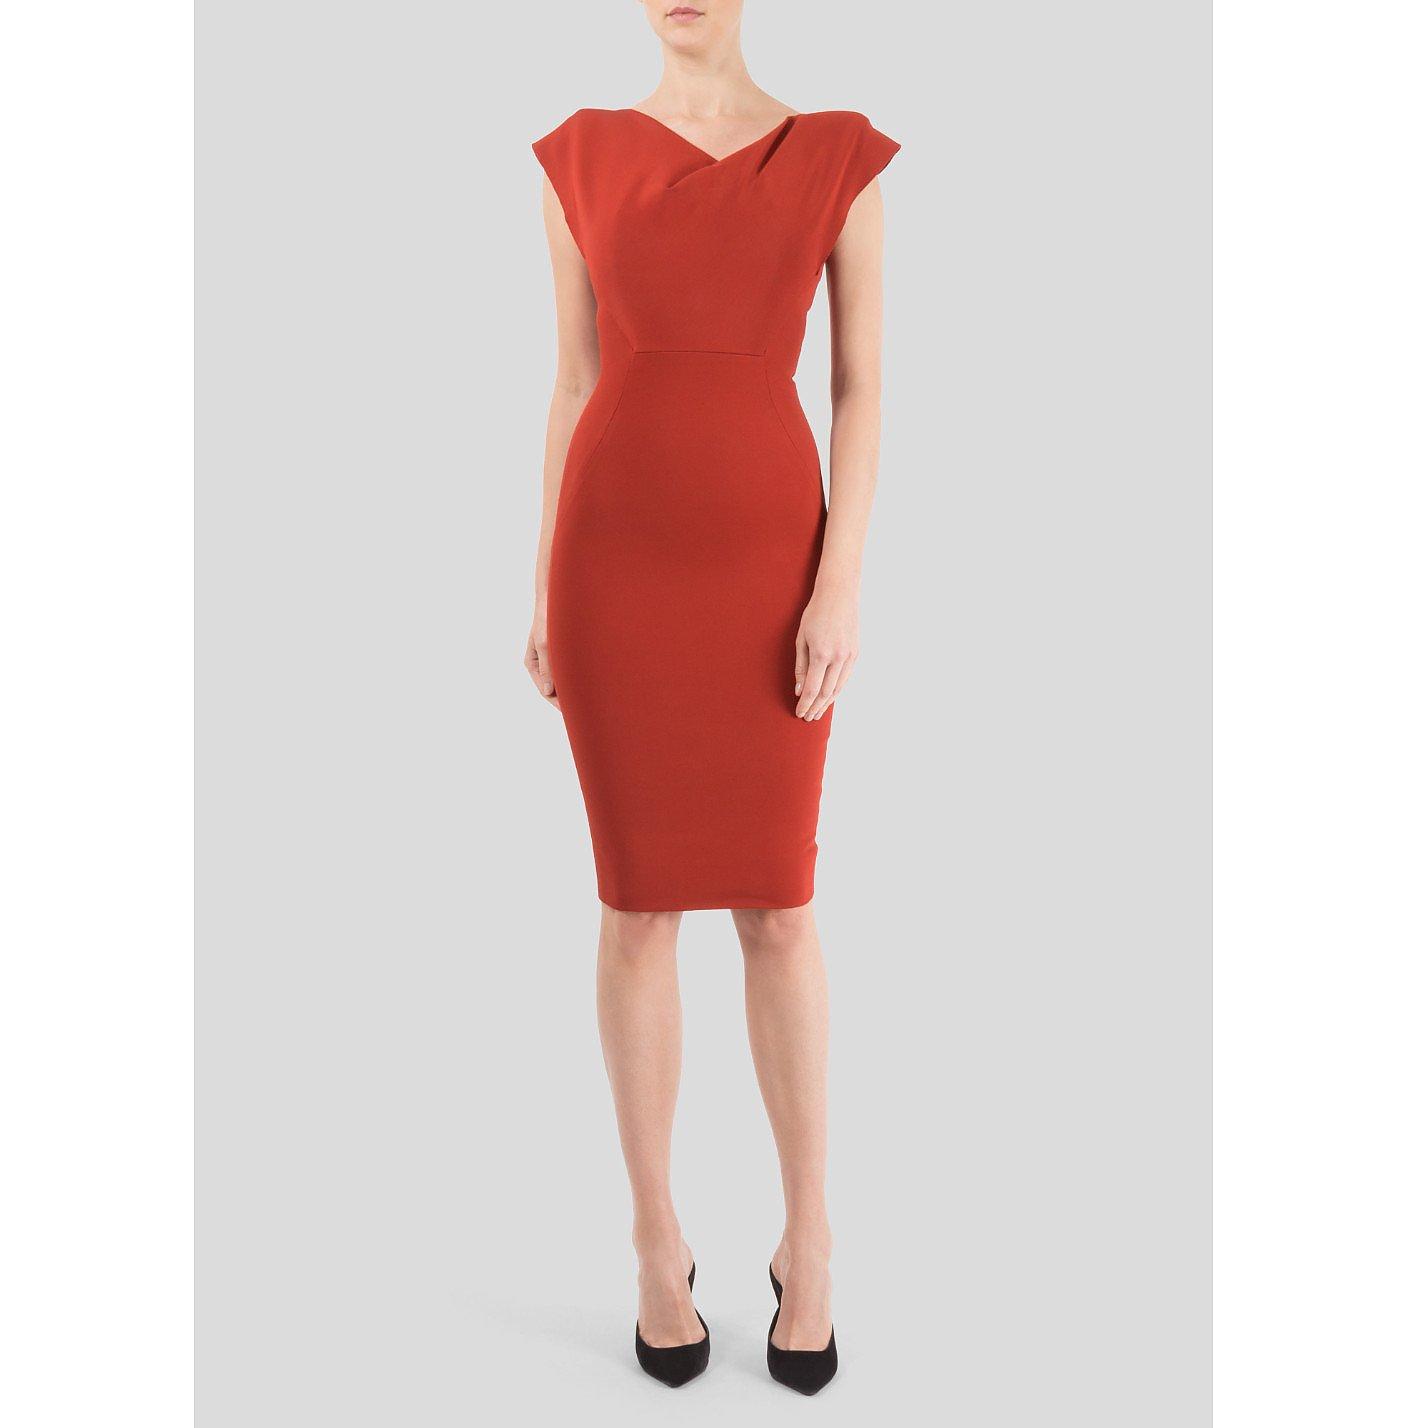 Victoria Beckham Fitted Fold Neck Dress